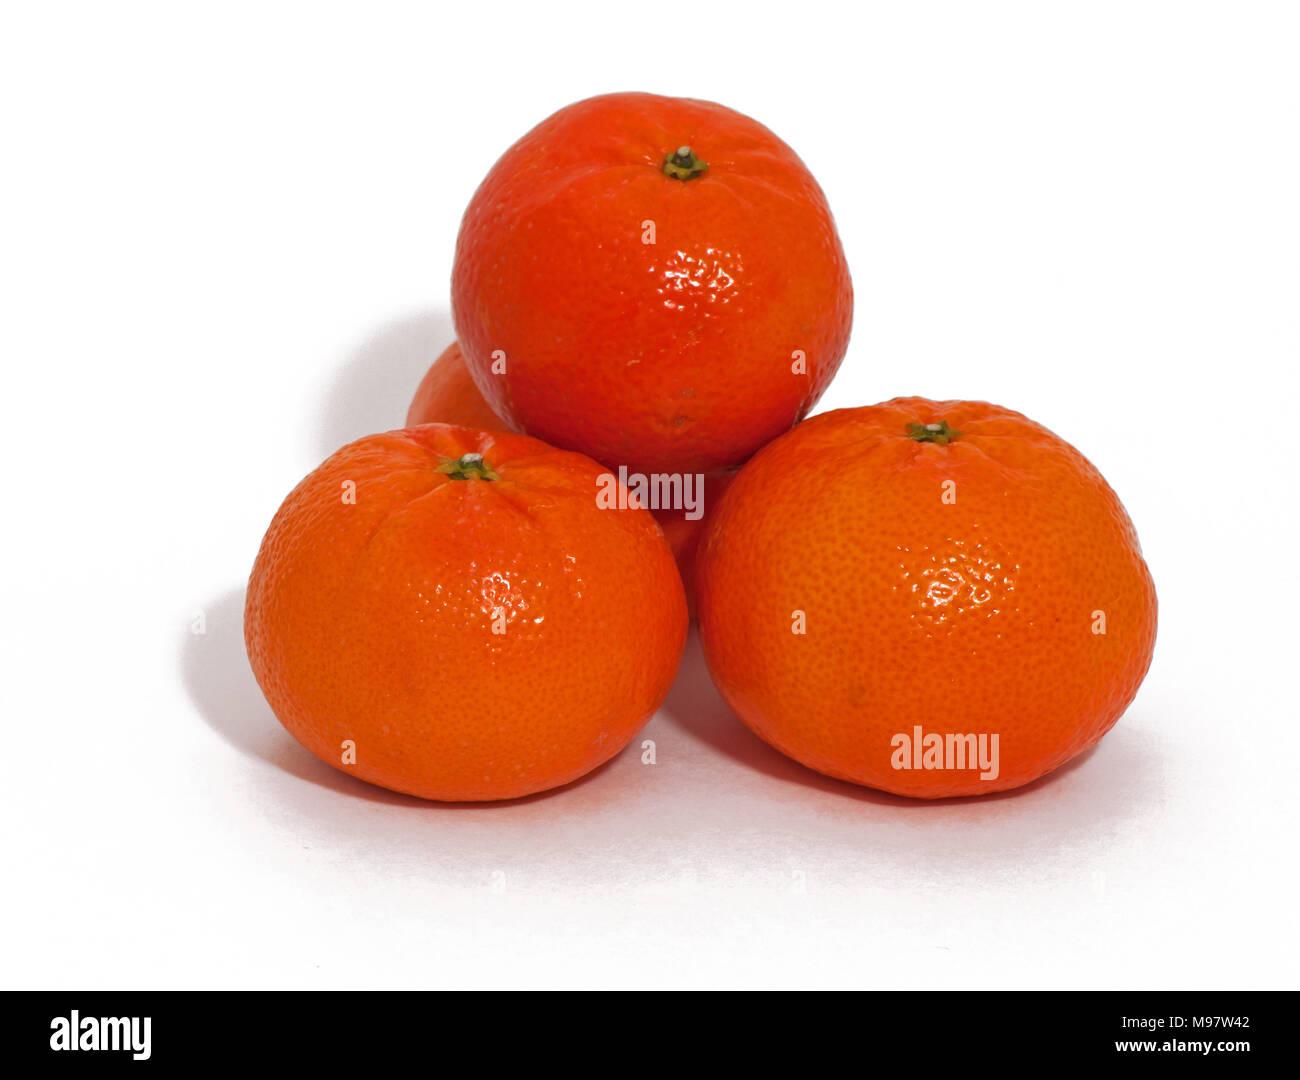 Stacked oranges with white background isolated - Stock Image